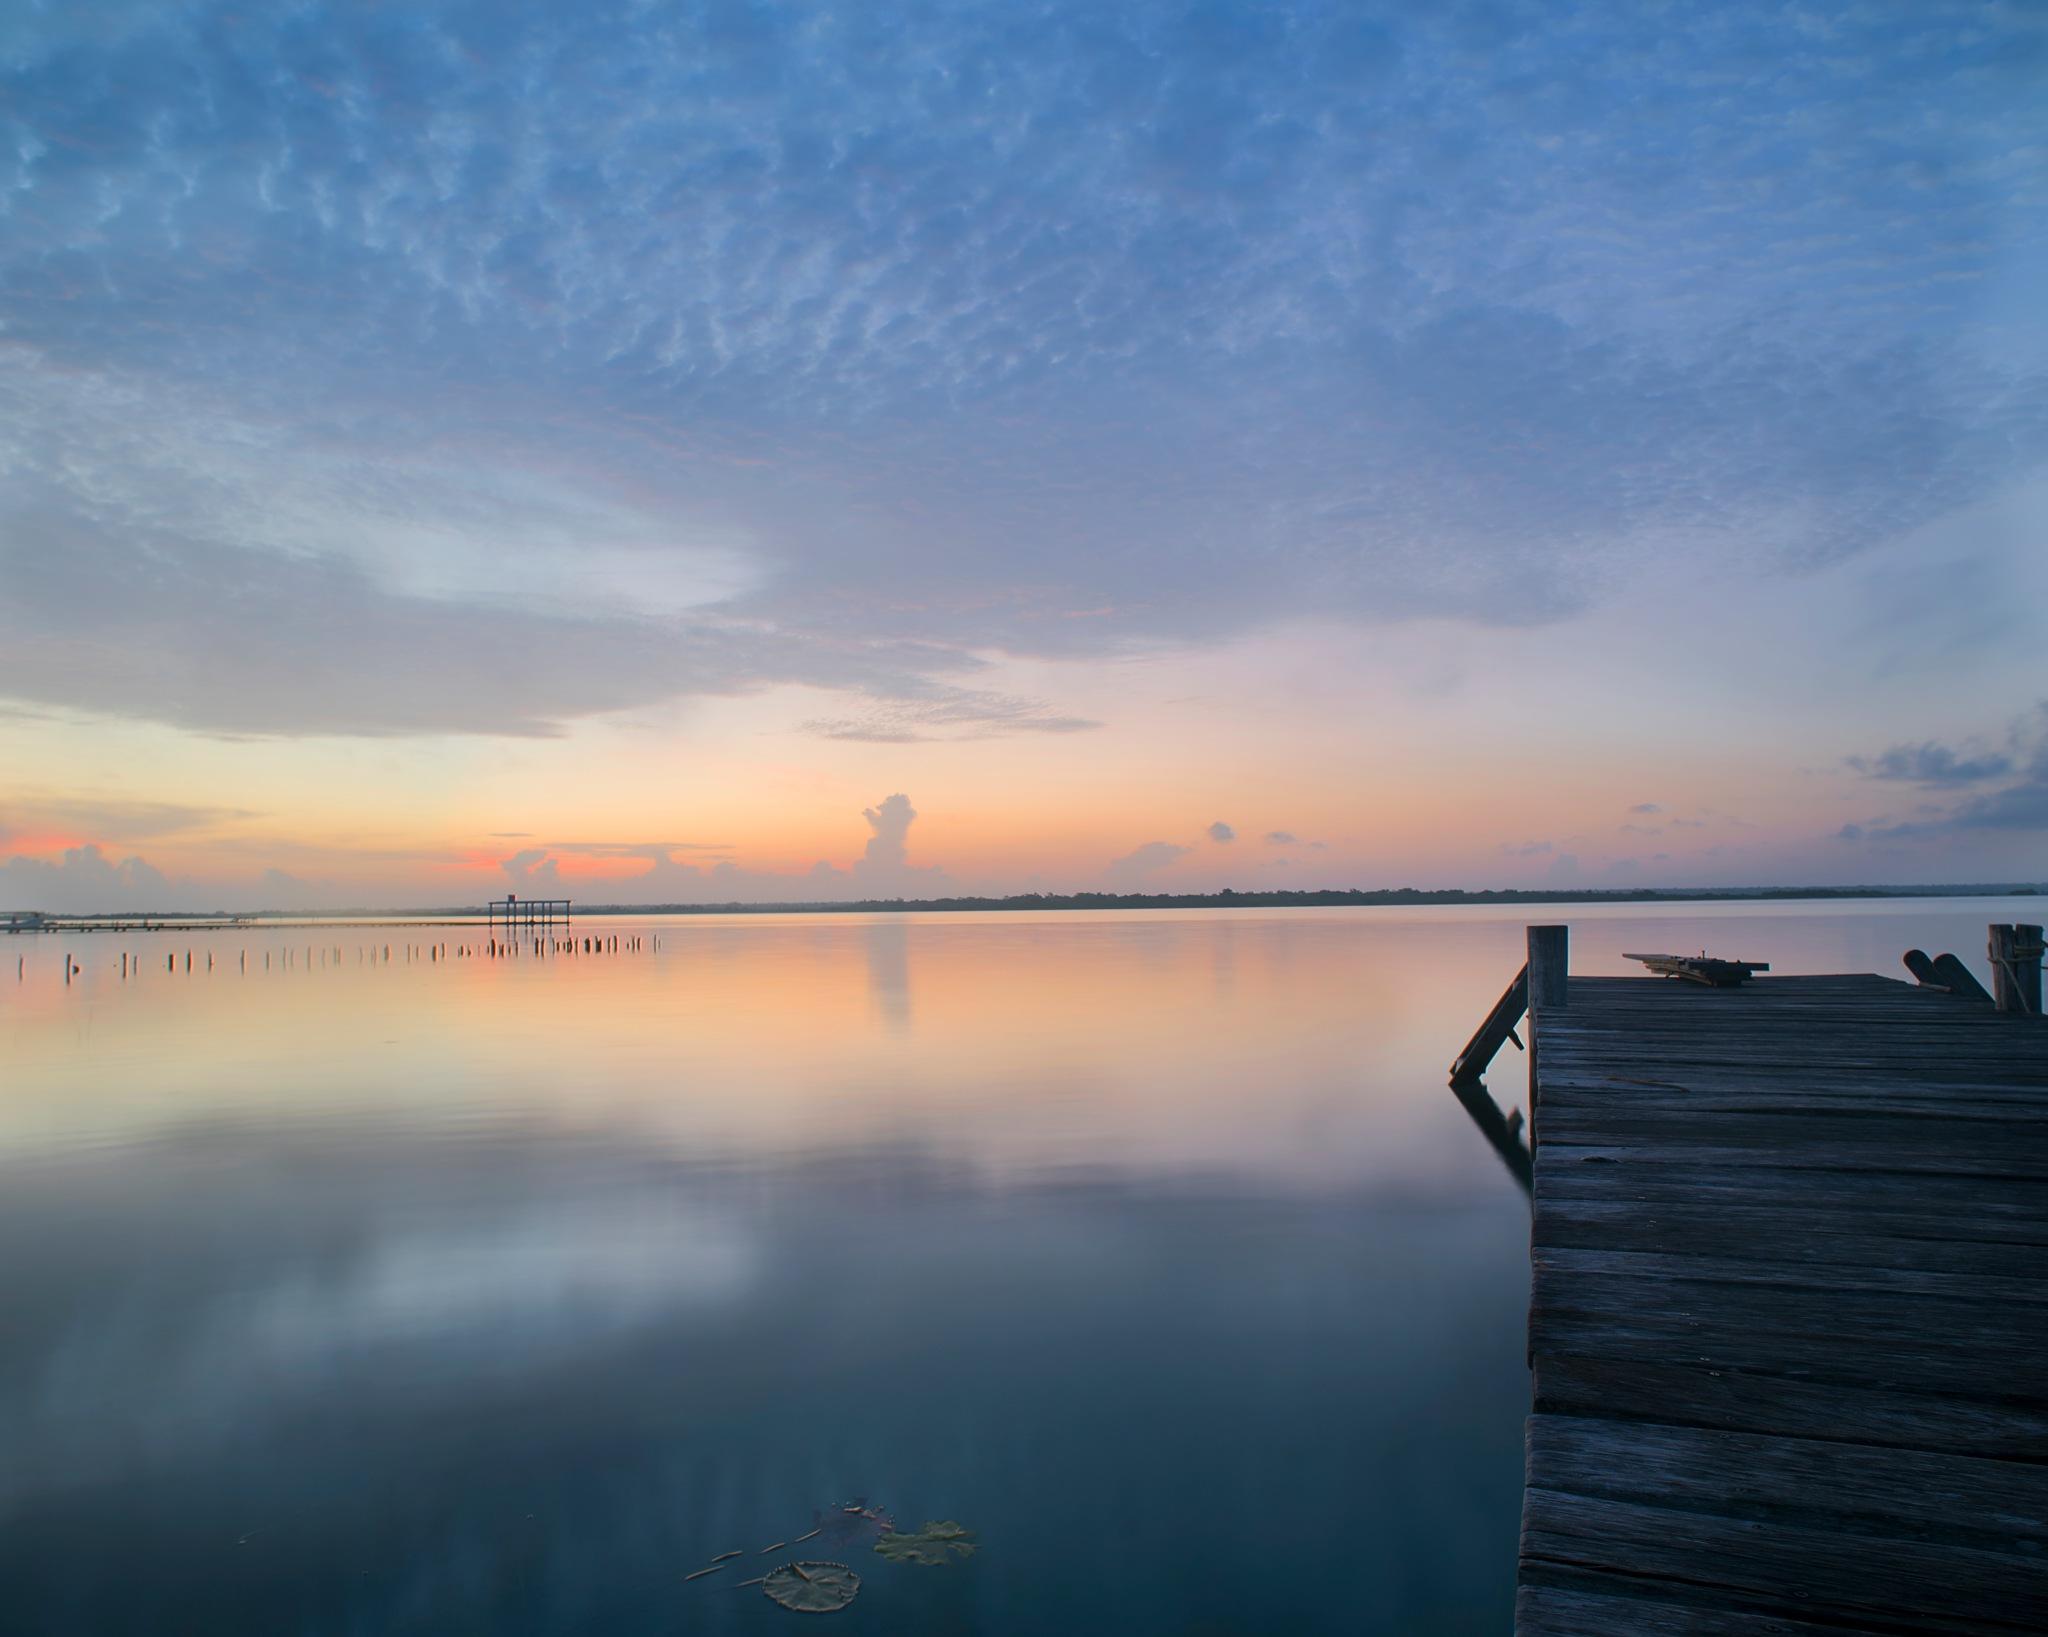 Sunset deck by fernandezoscar